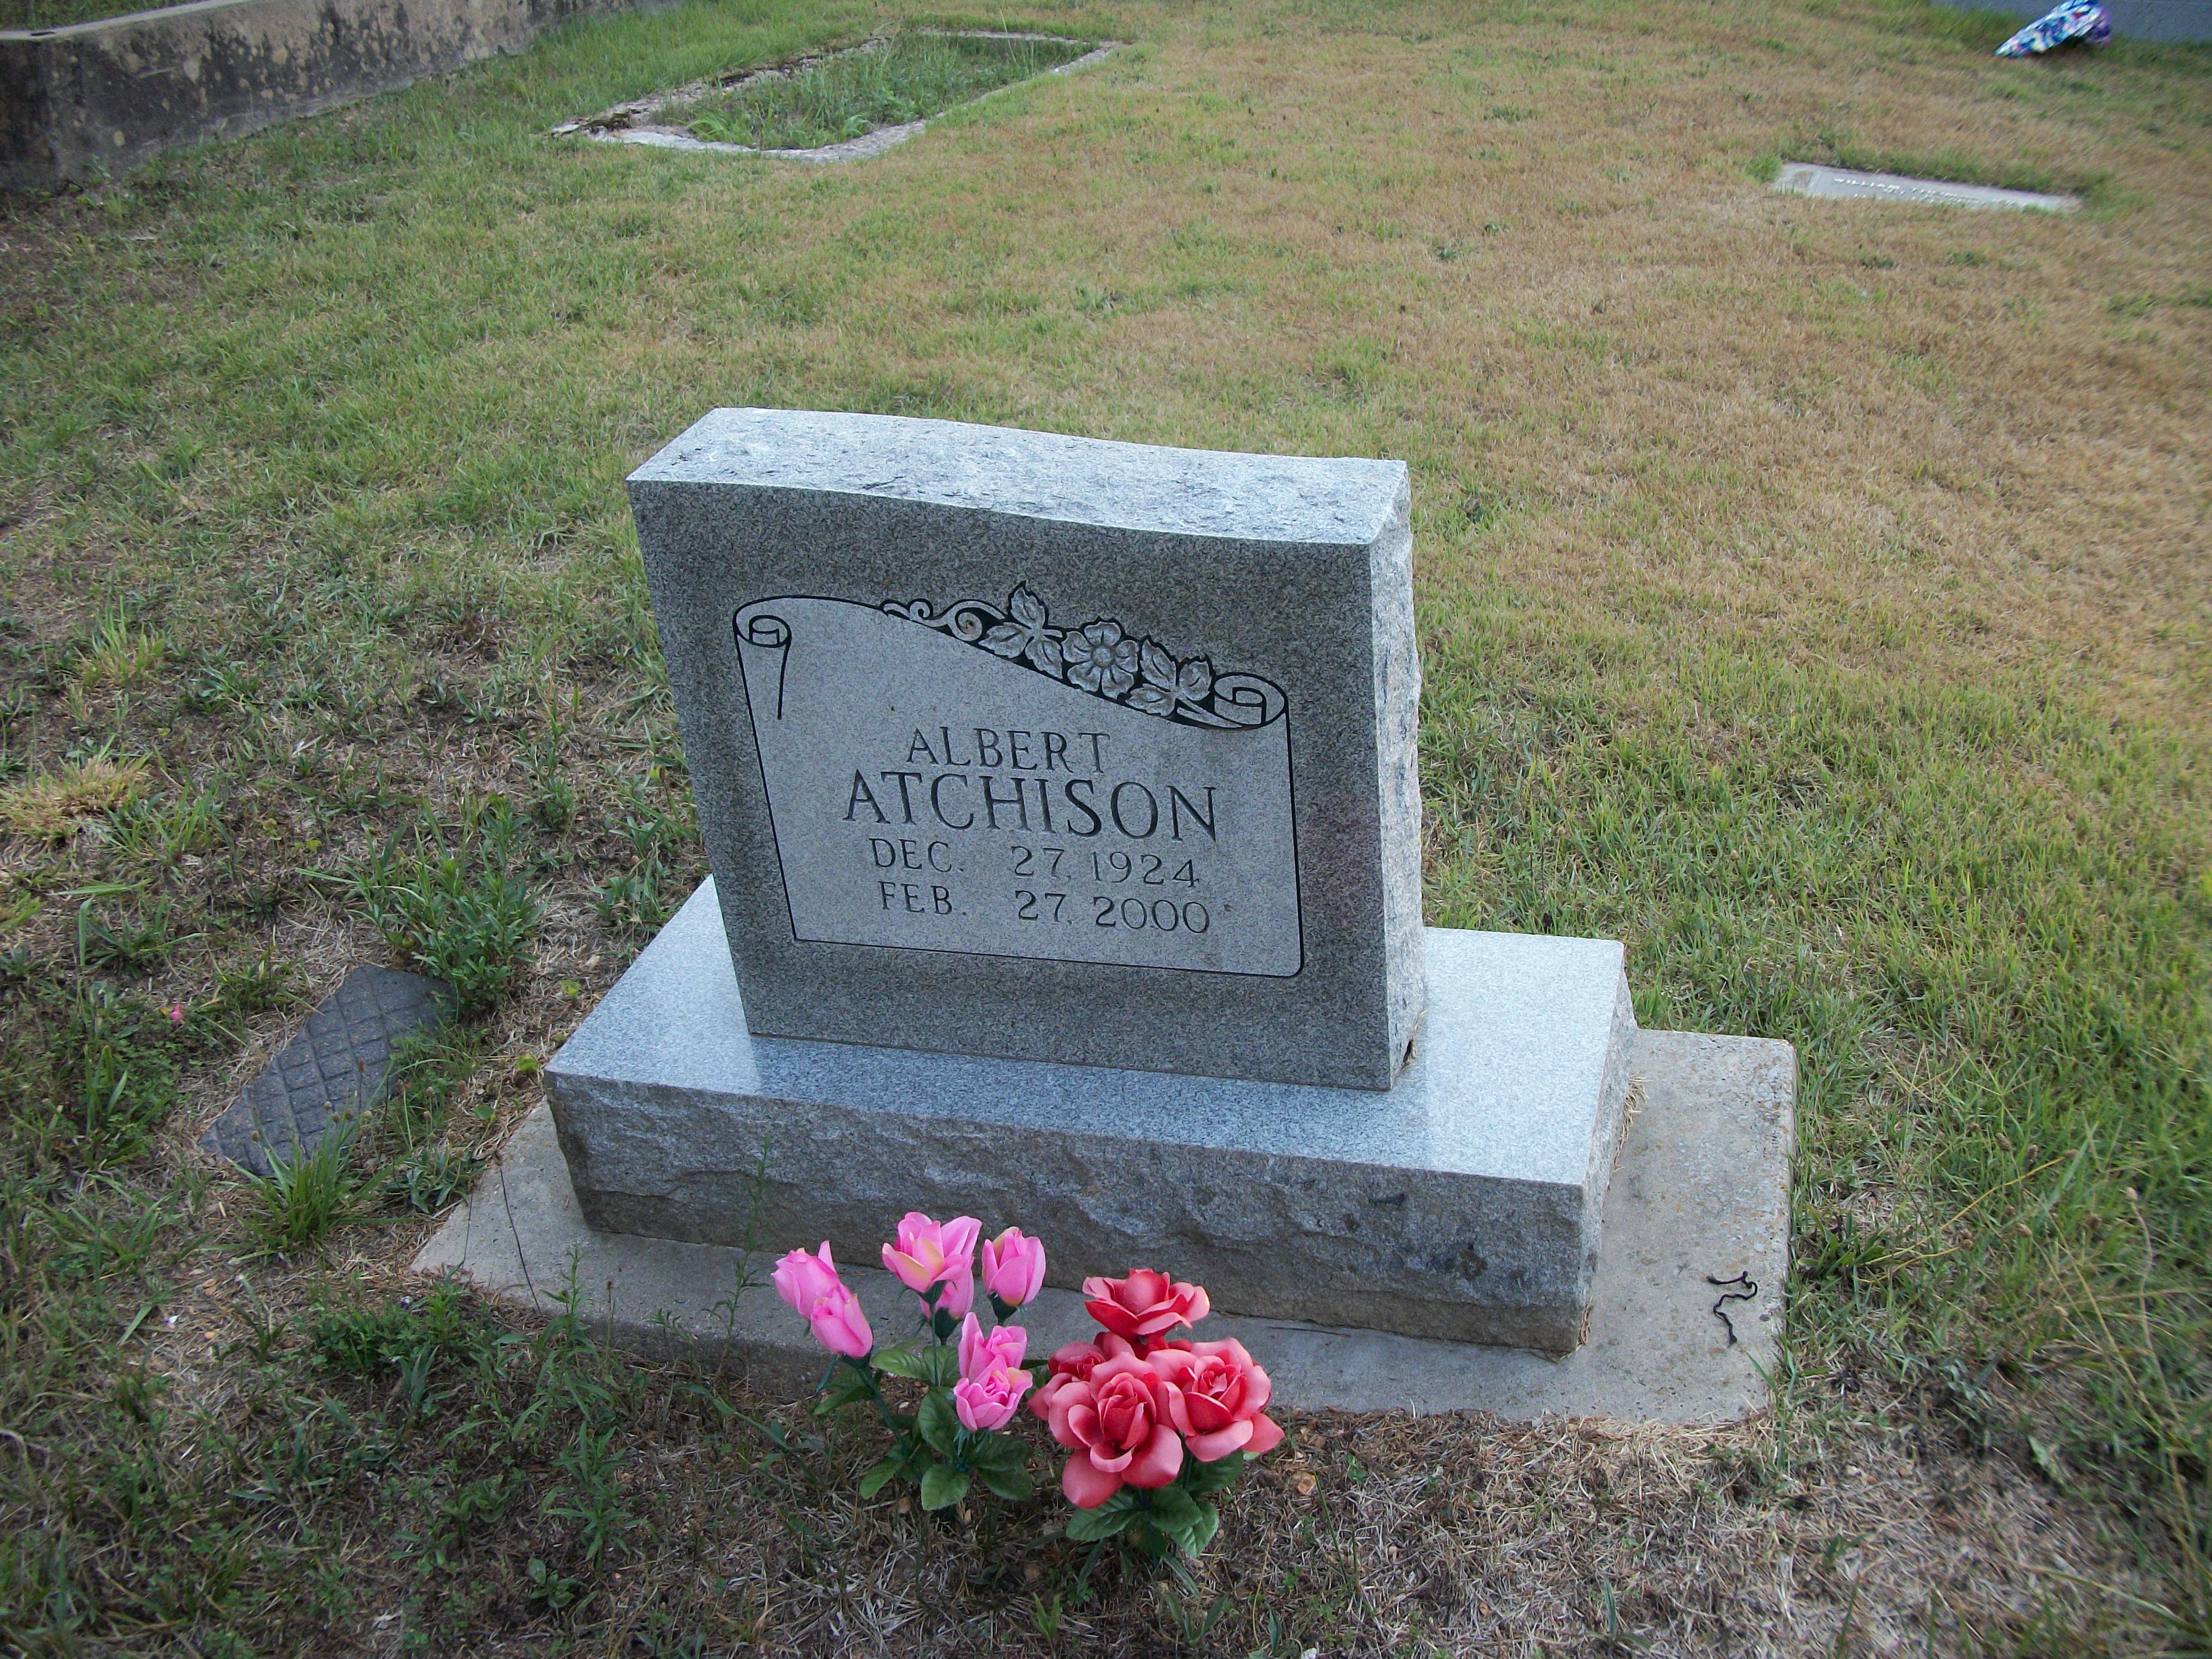 Albert Atchison